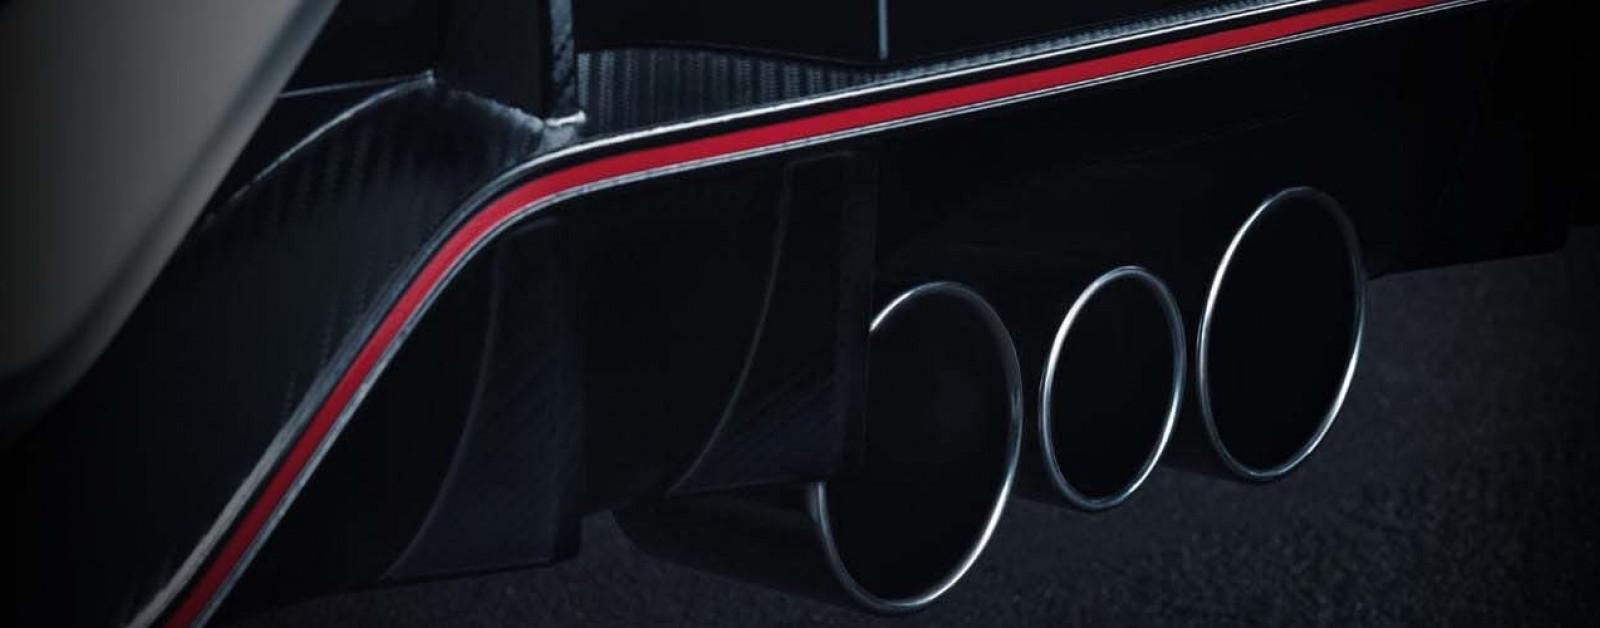 Civic Hatch Type R